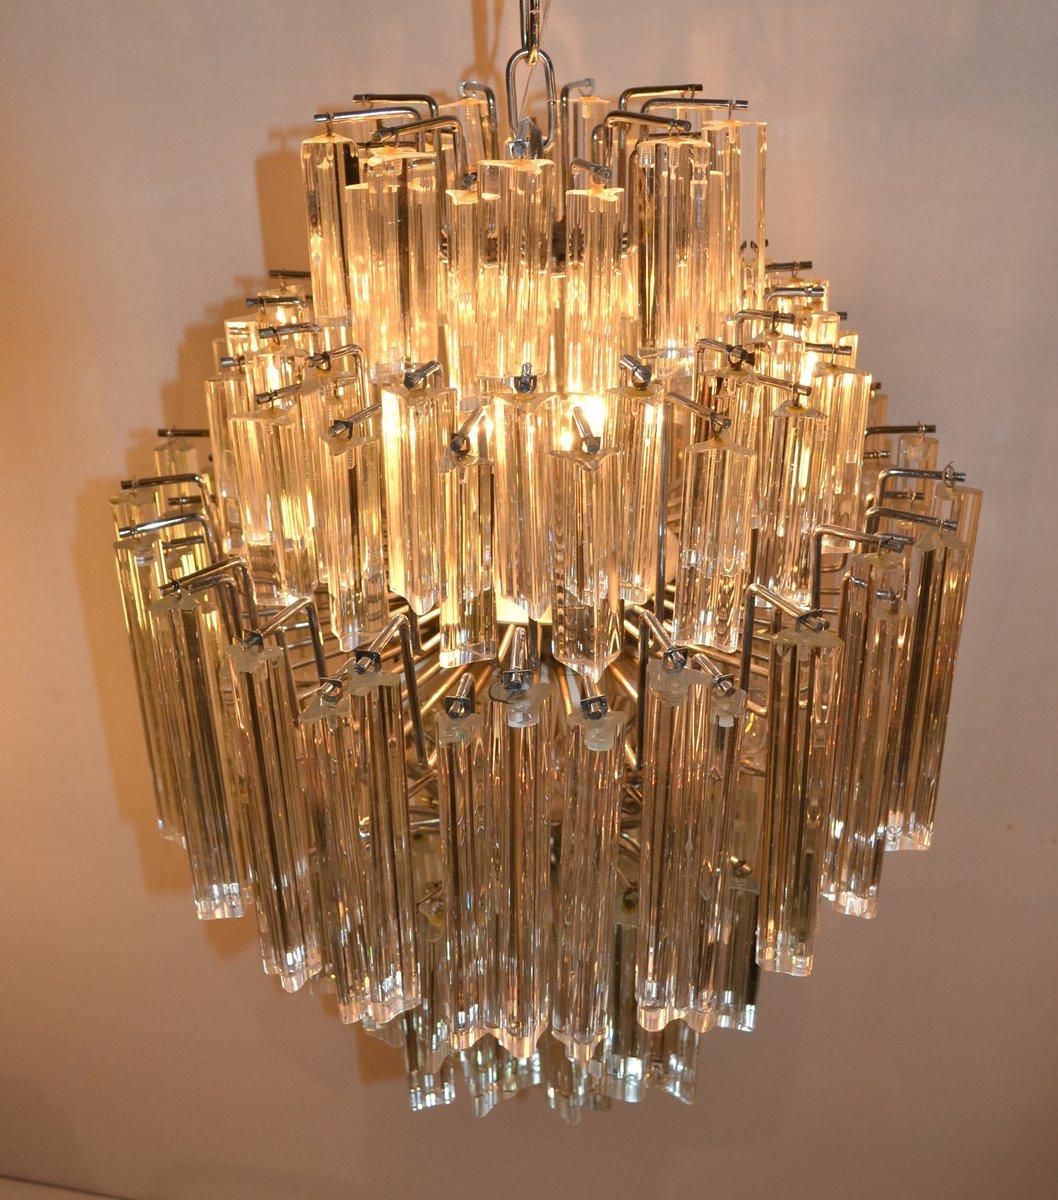 Vintage venini chandeliers chandelier designs vintage venini chandeliers chandelier designs arubaitofo Gallery